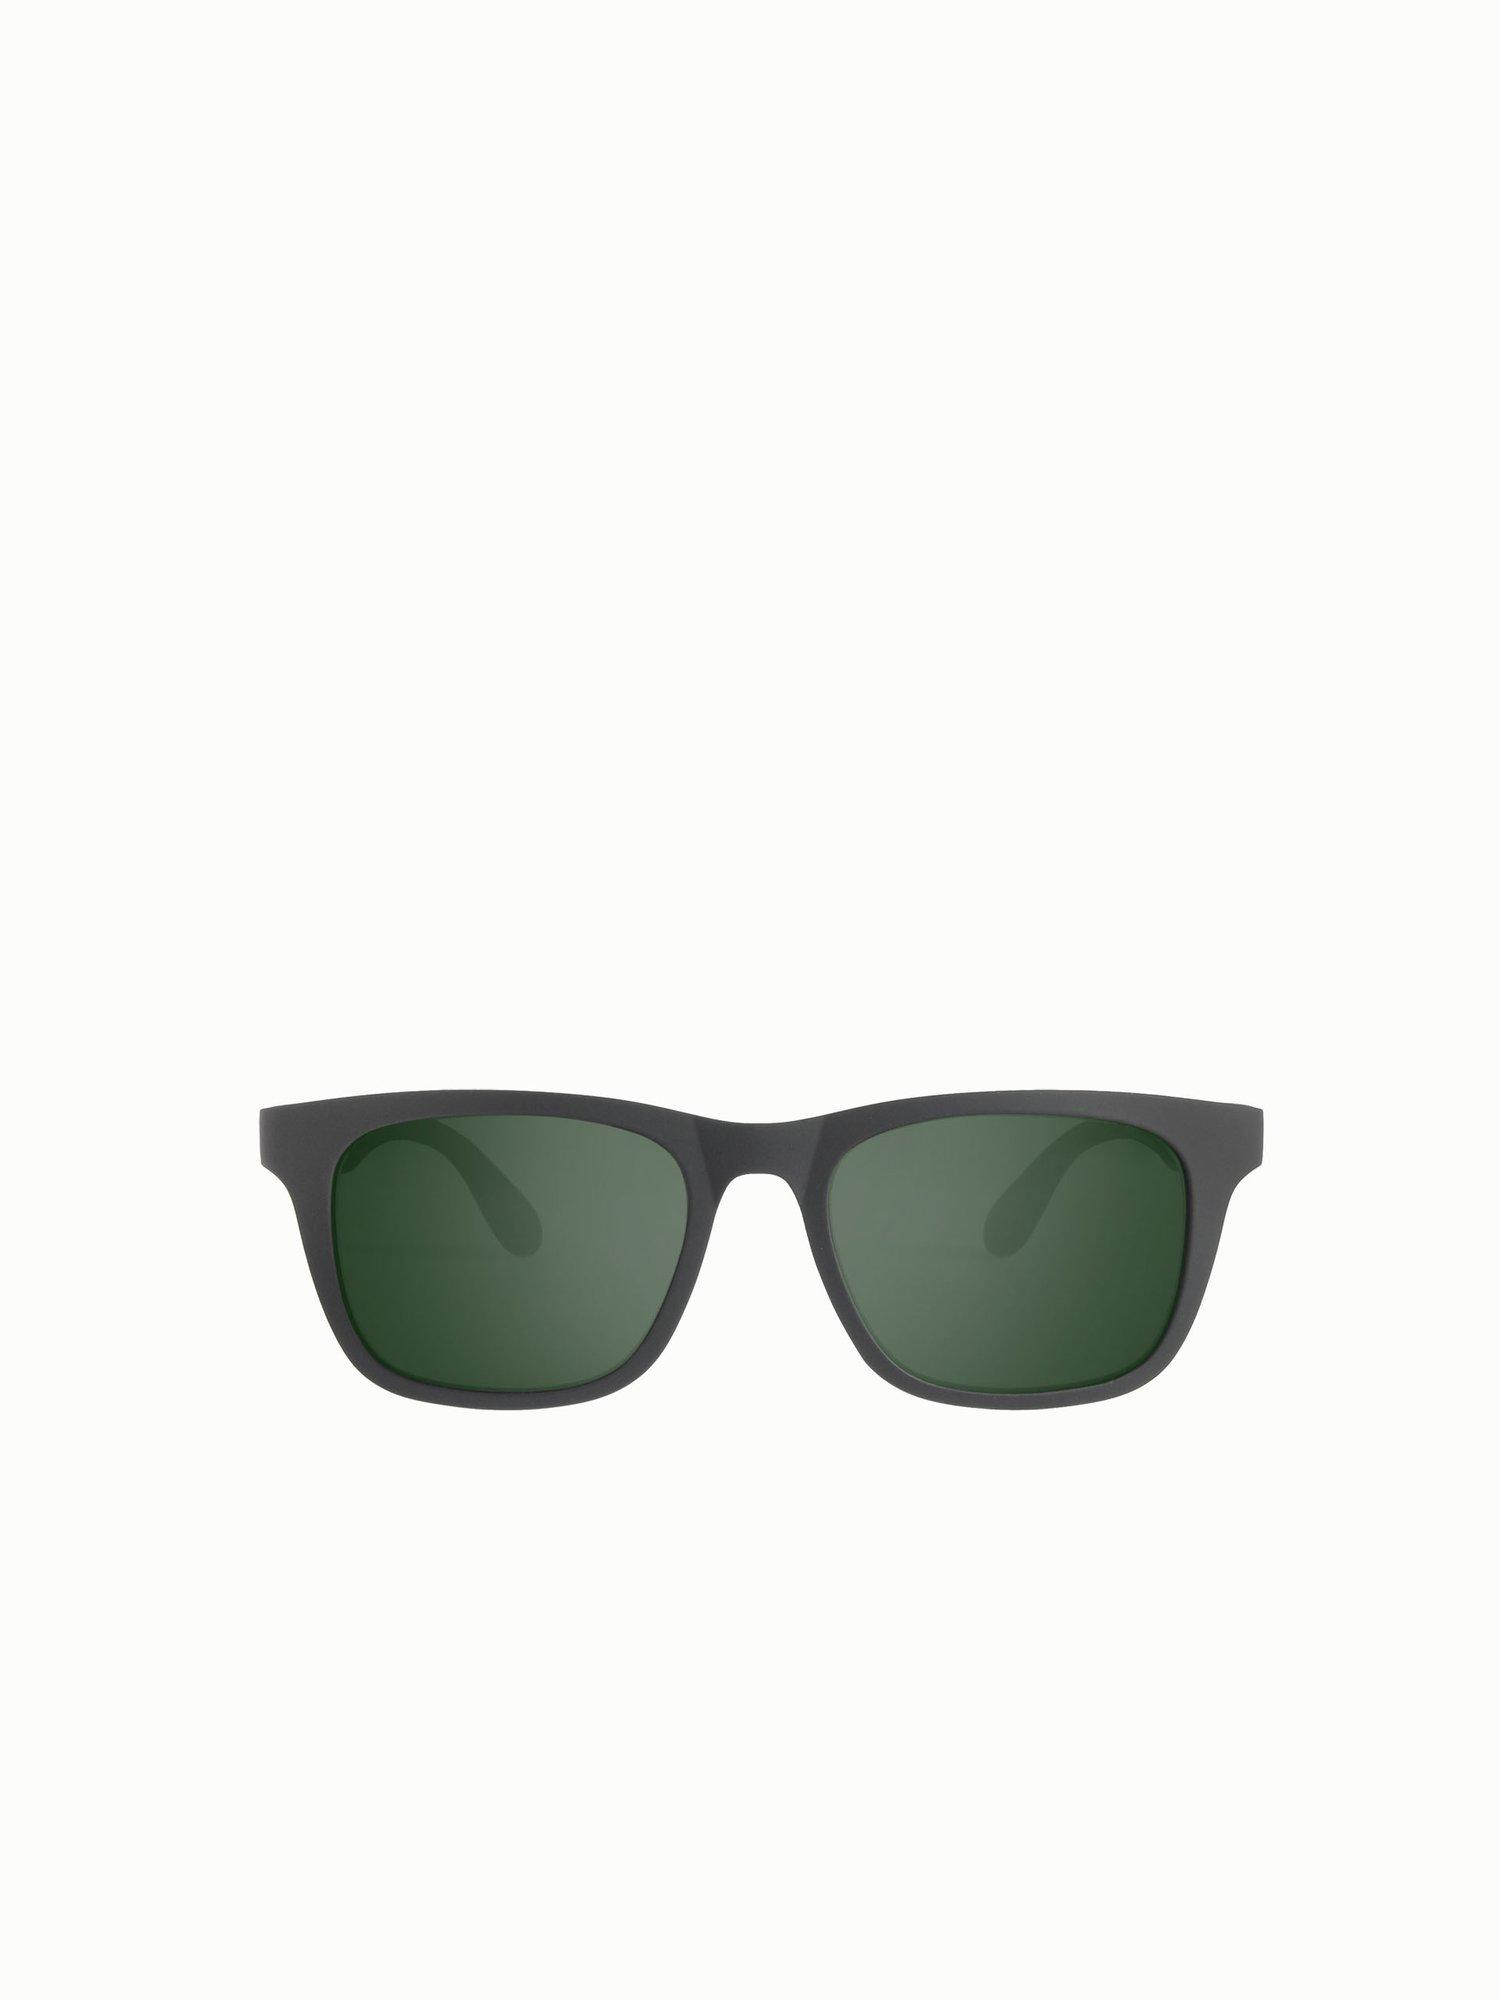 Yachting Sunglasses Man - Gris Oscuro / Azul Marino / Verde /